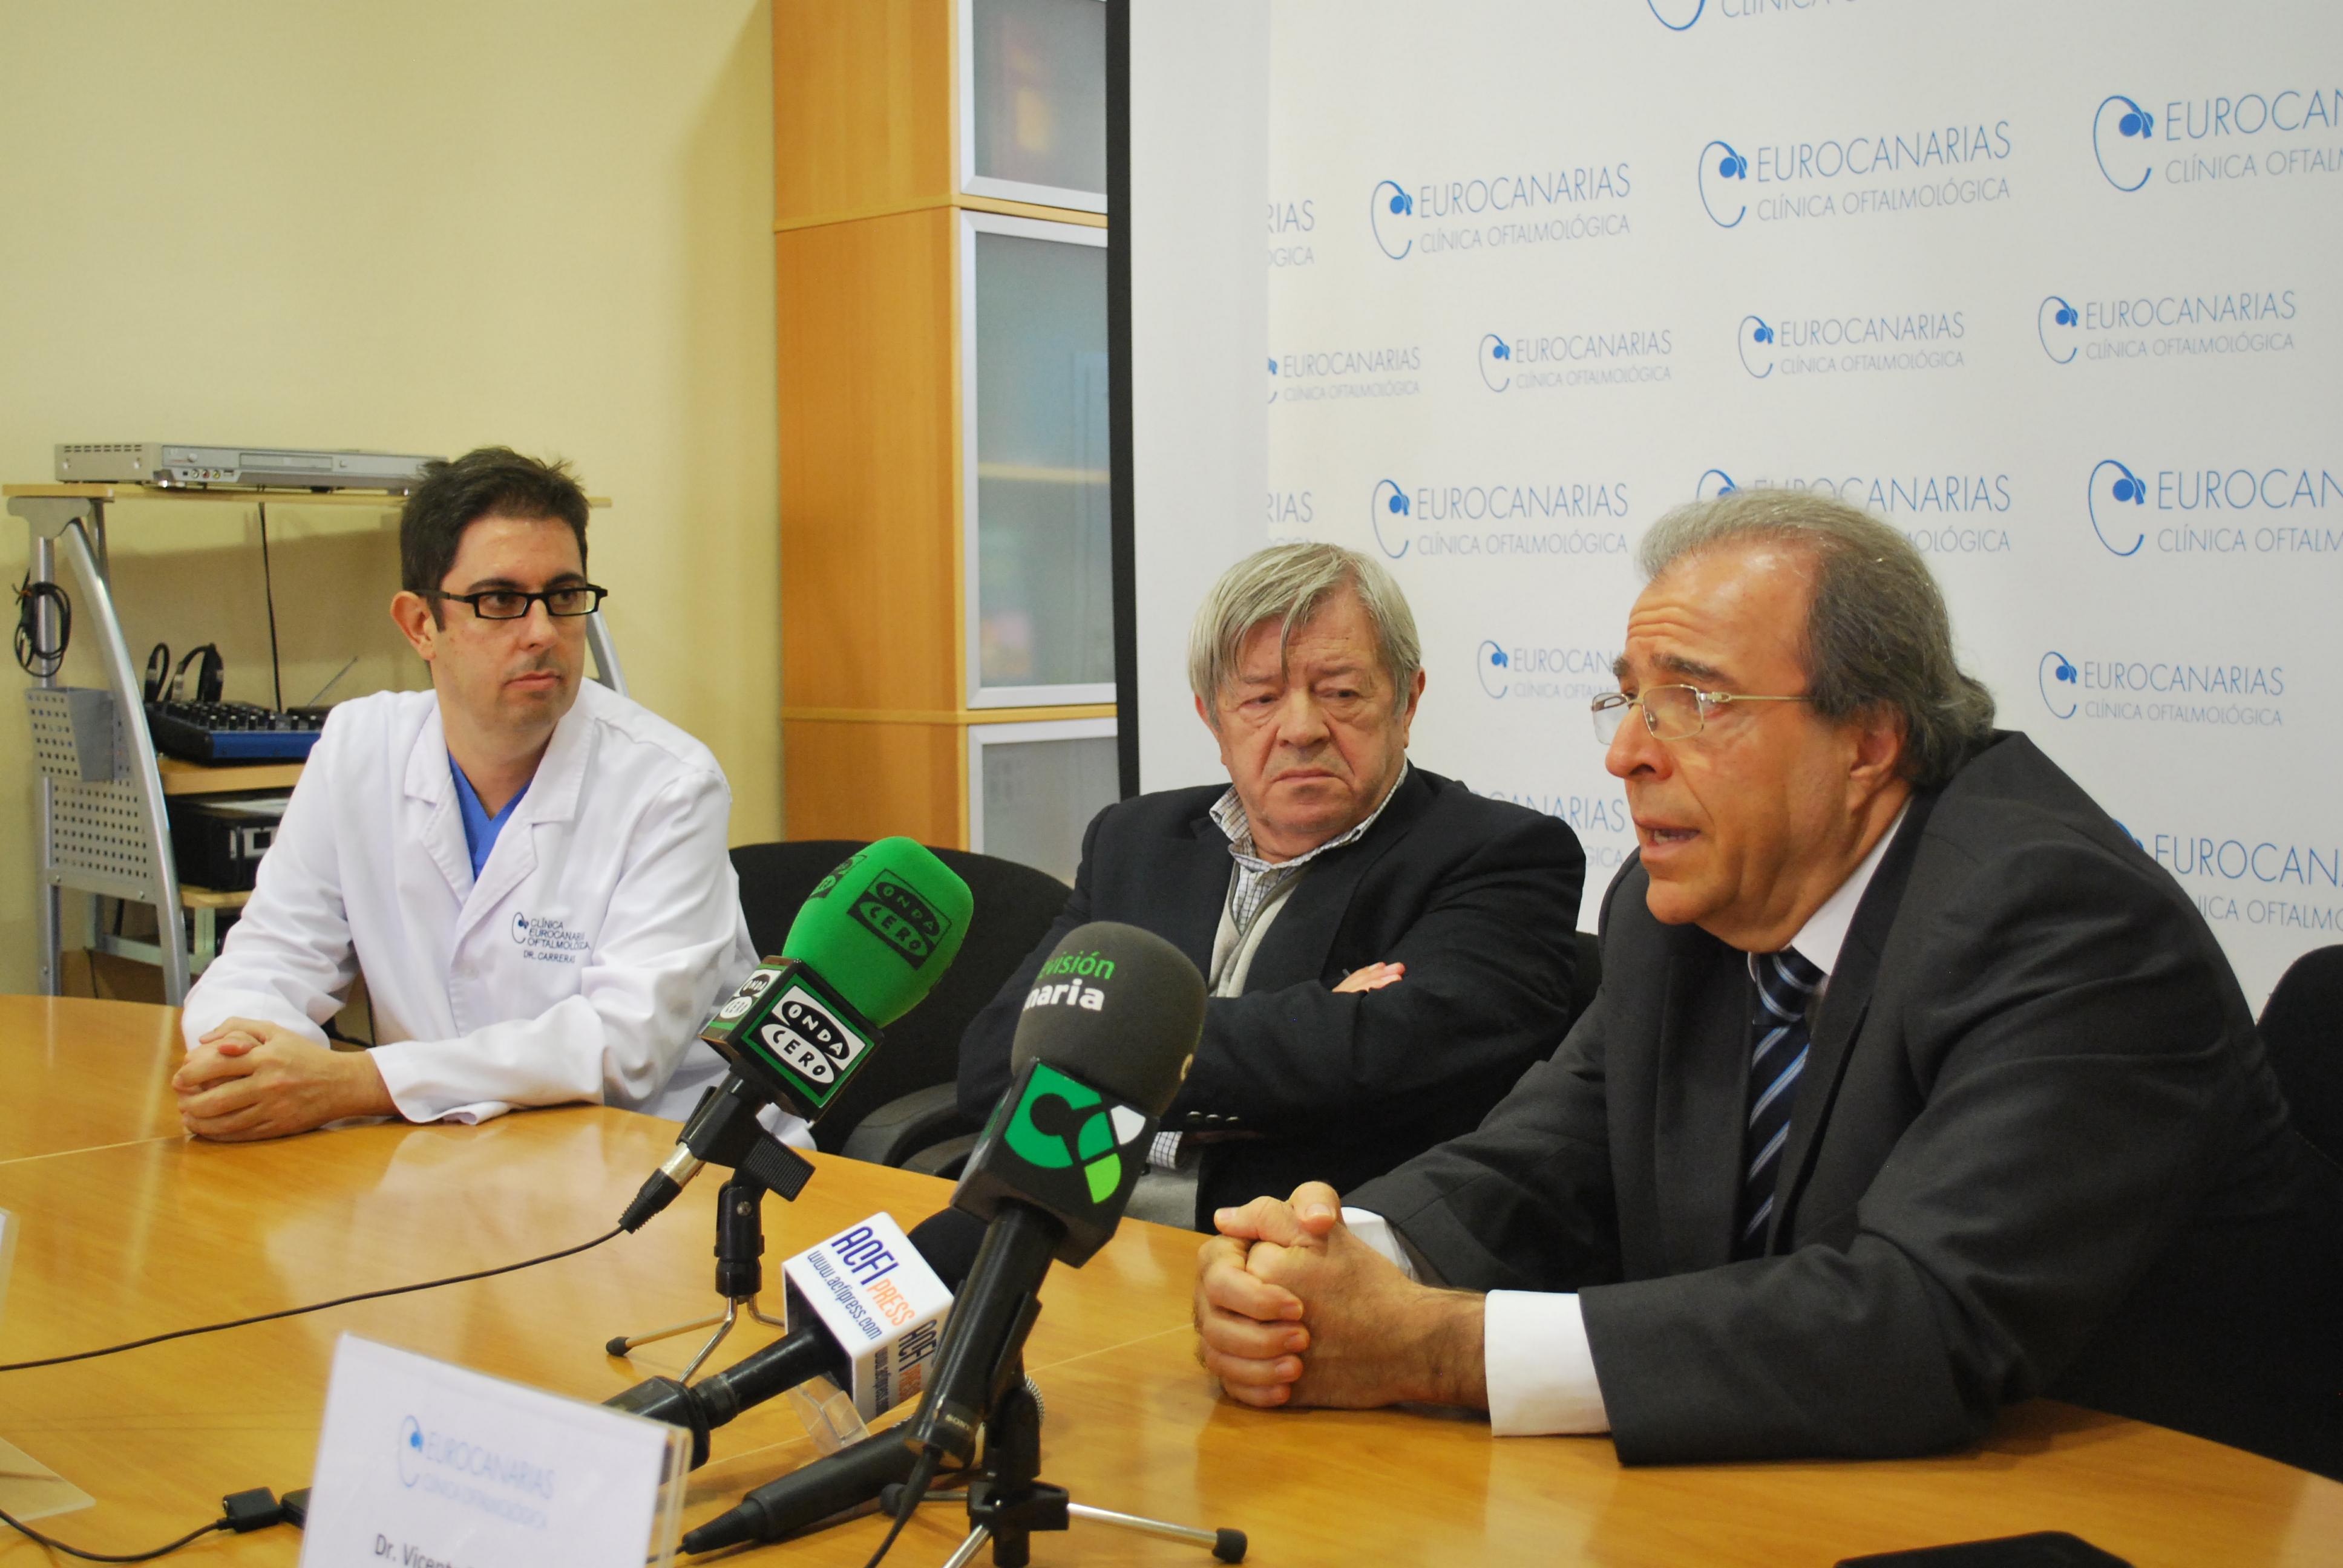 Eurocanarias Oftalmológica apoya la campaña navideña de Casa de Galicia